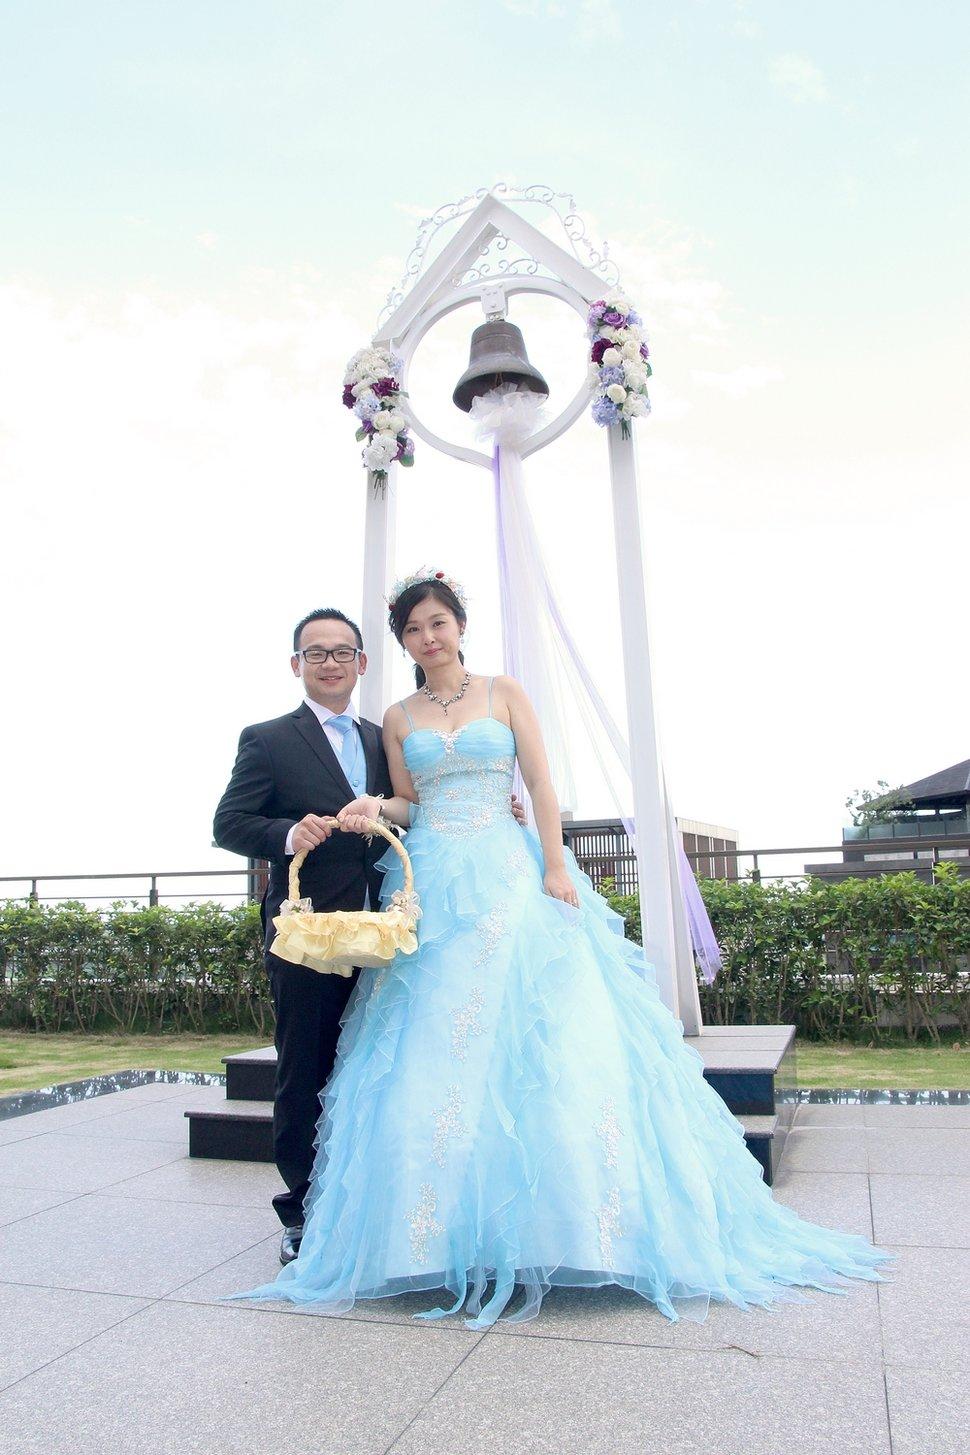 IMG_0355 - 瑞比特婚禮紀錄攝影 - 結婚吧